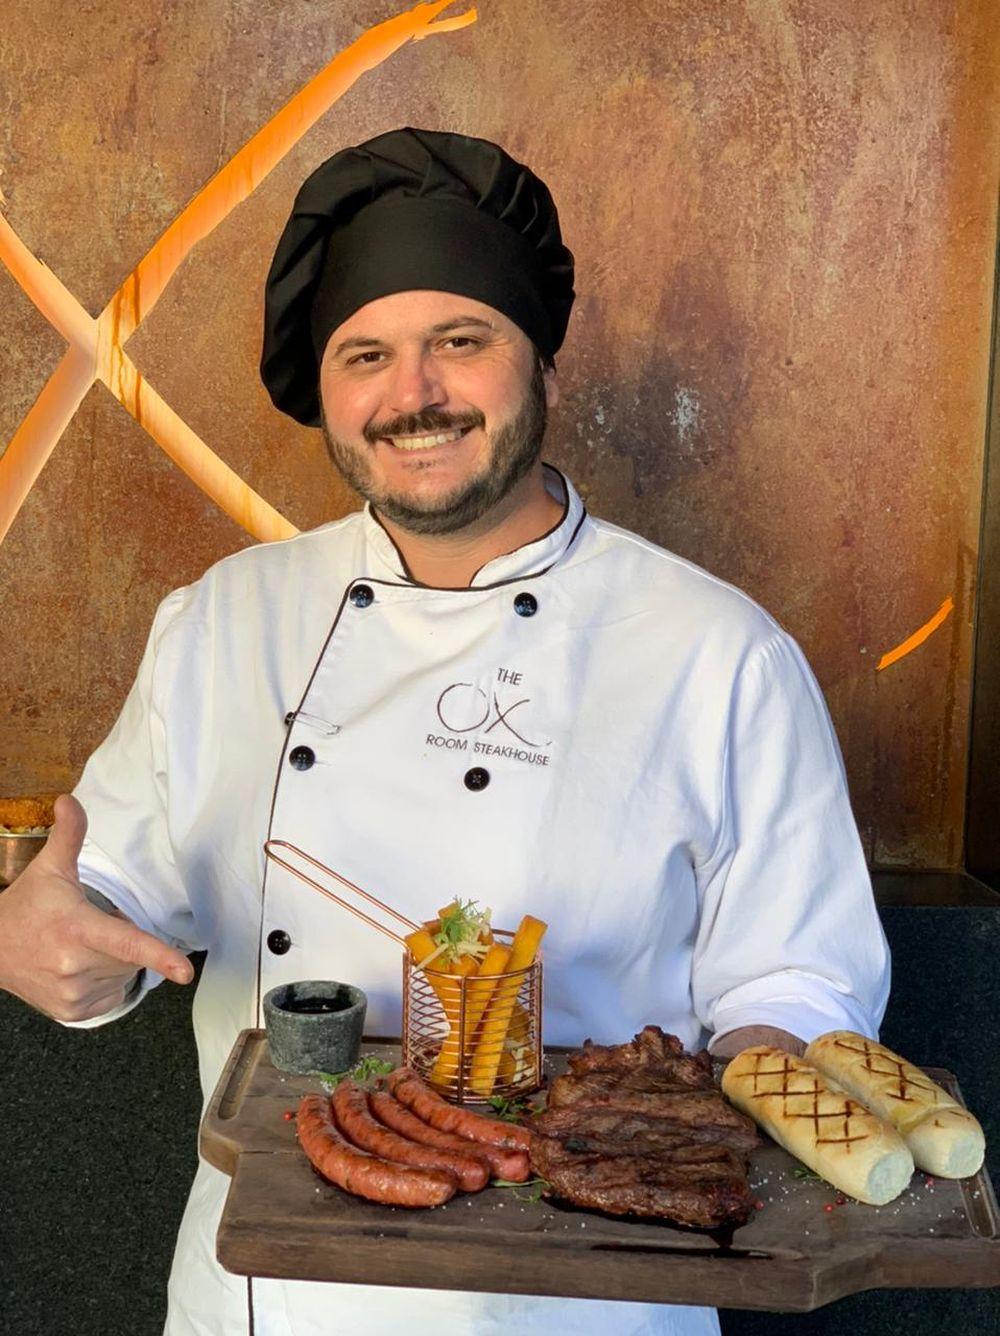 ox room steakhouse - promo dia dos pais 1 chef leandro fernandes - foto divulgacao